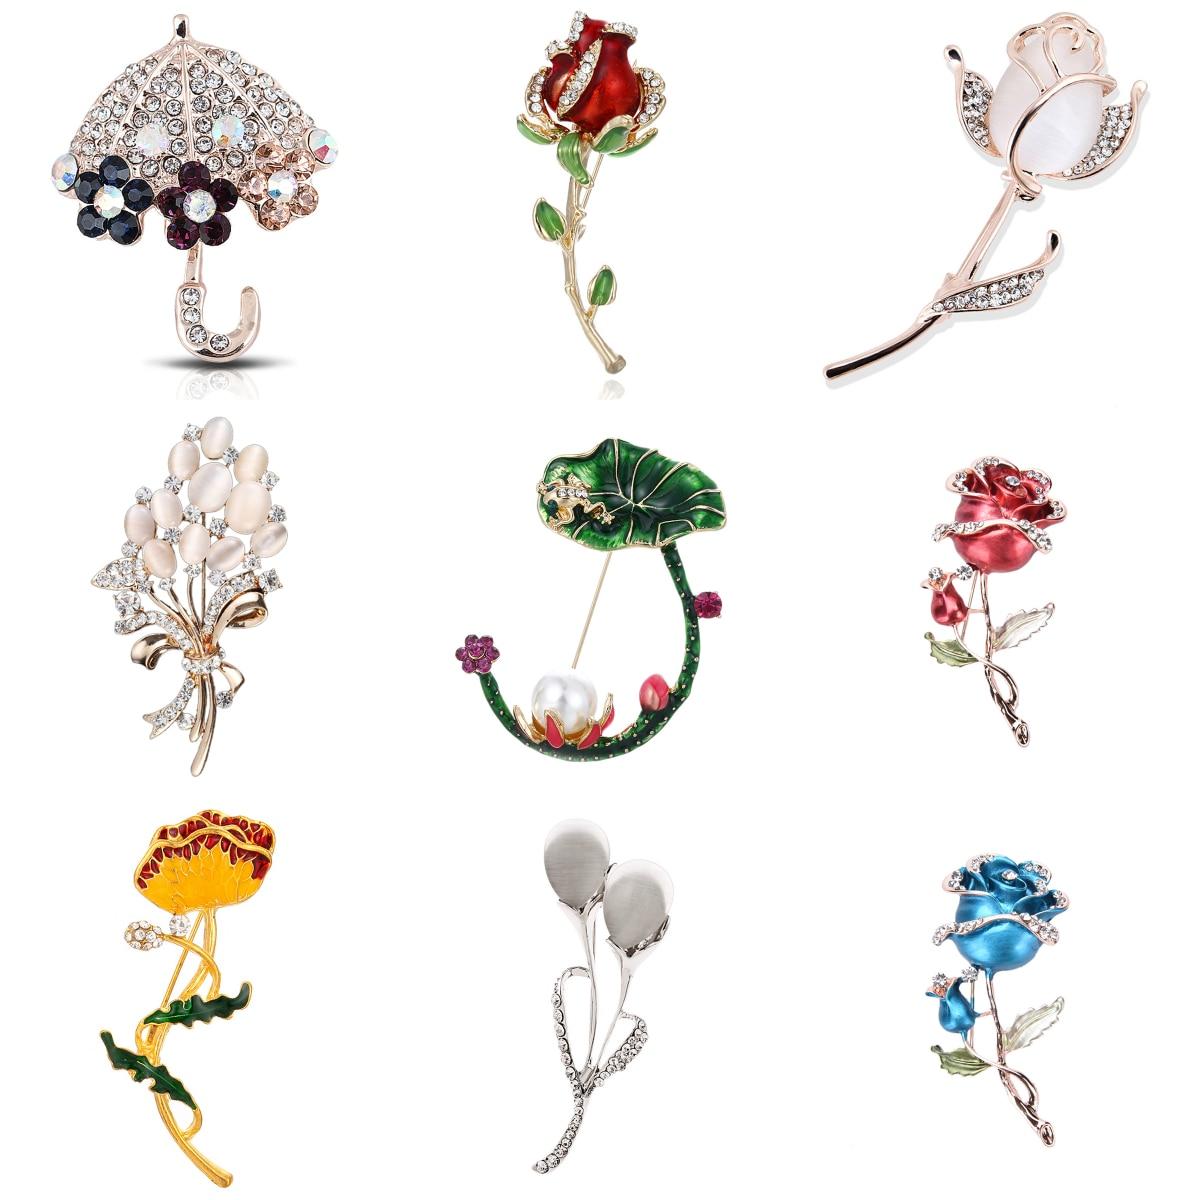 Flor do vintage rosa tulipa guarda-chuva orquídea strass pinos e broches para mulheres colar lapela pinos distintivo broche jóias femininas